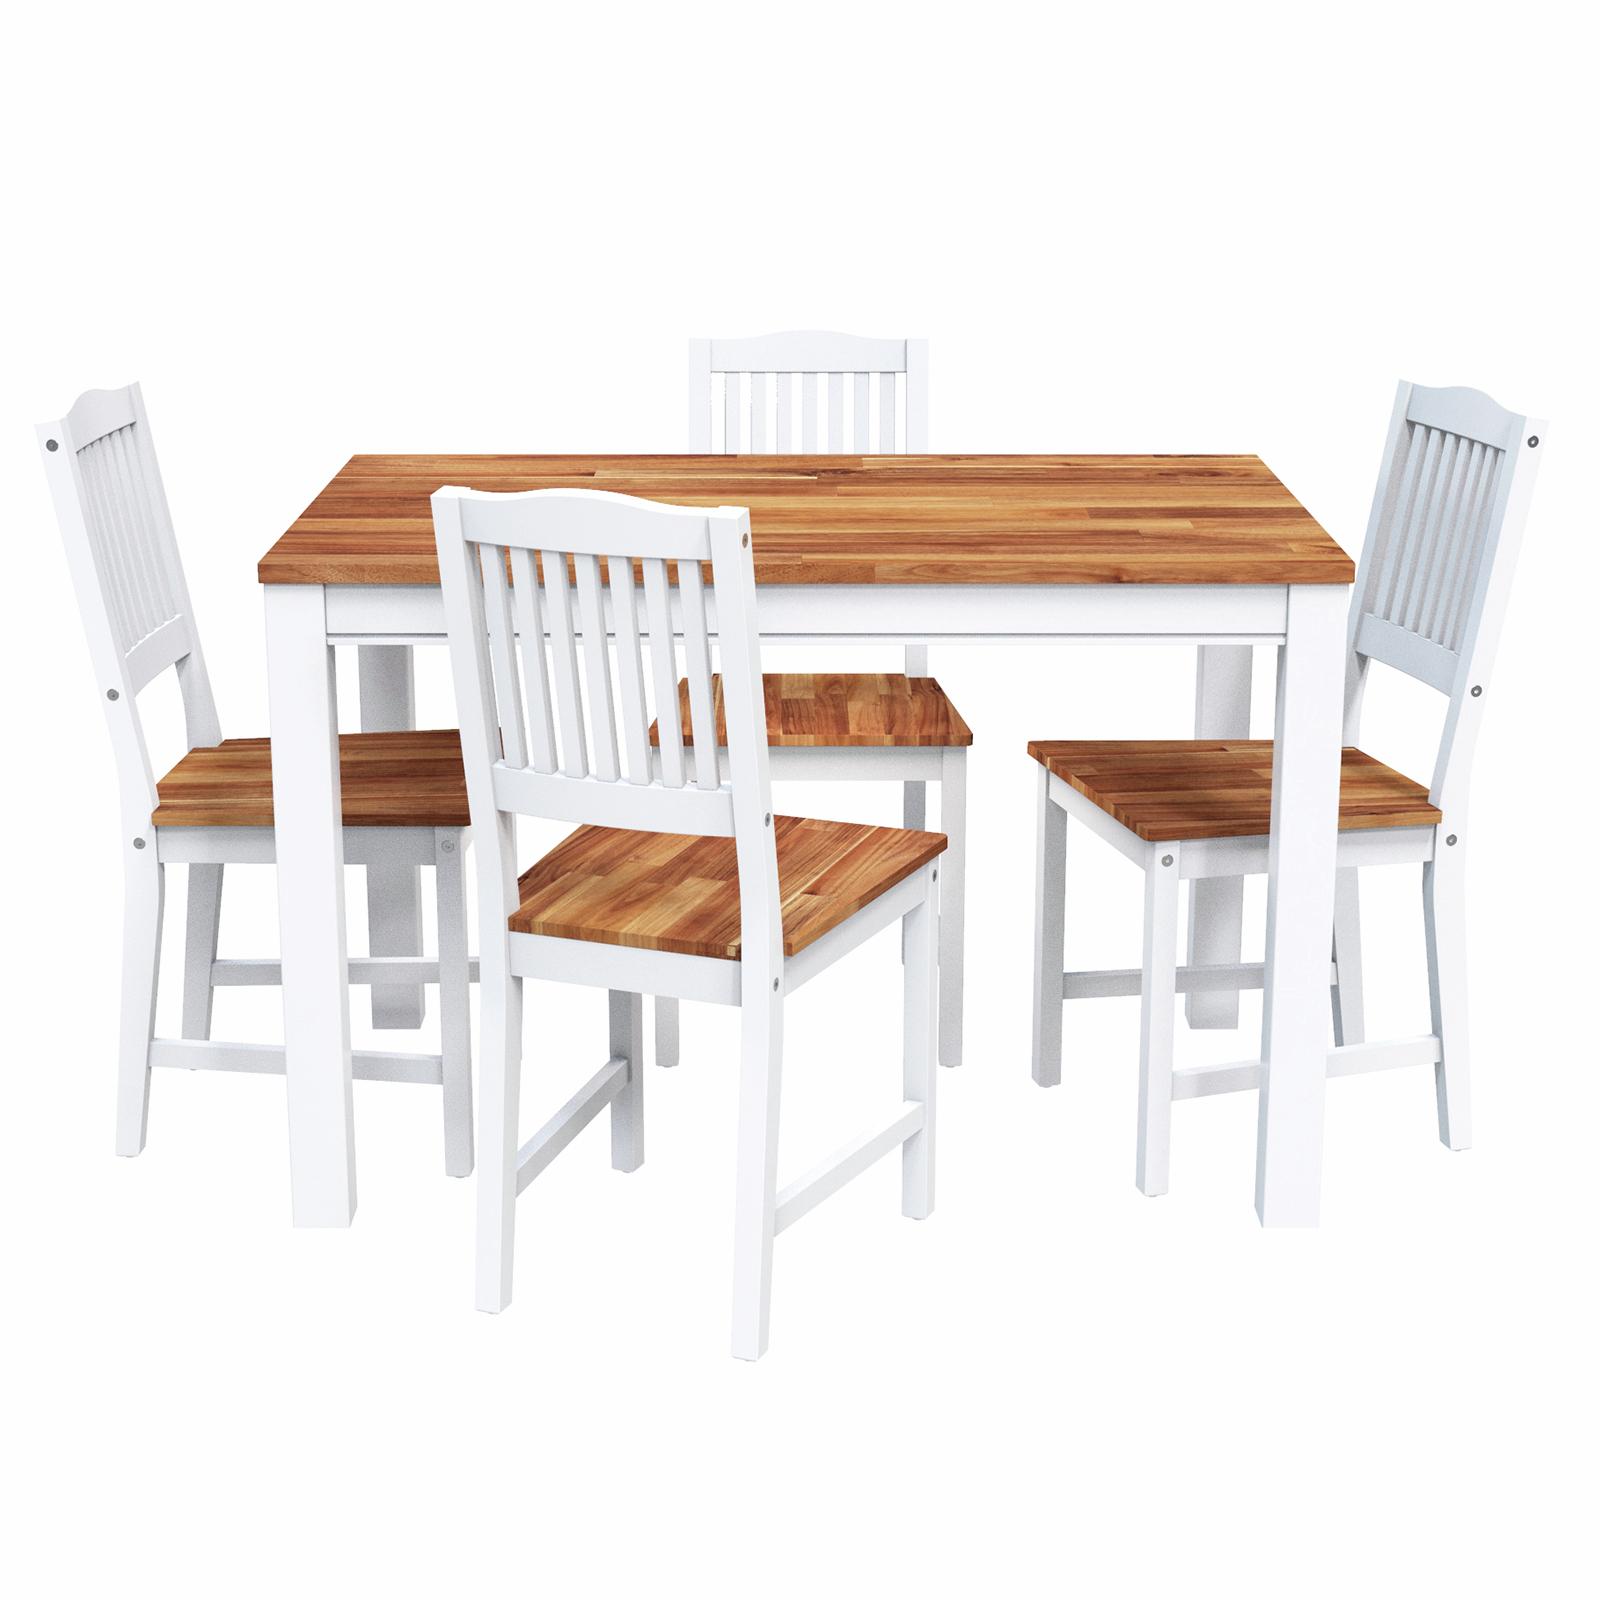 Interbuild Hardwood Swoppmokk 5 Pieces Dining Set (1 Table with 4 Chairs), FSC Acacia, Oiled (White)